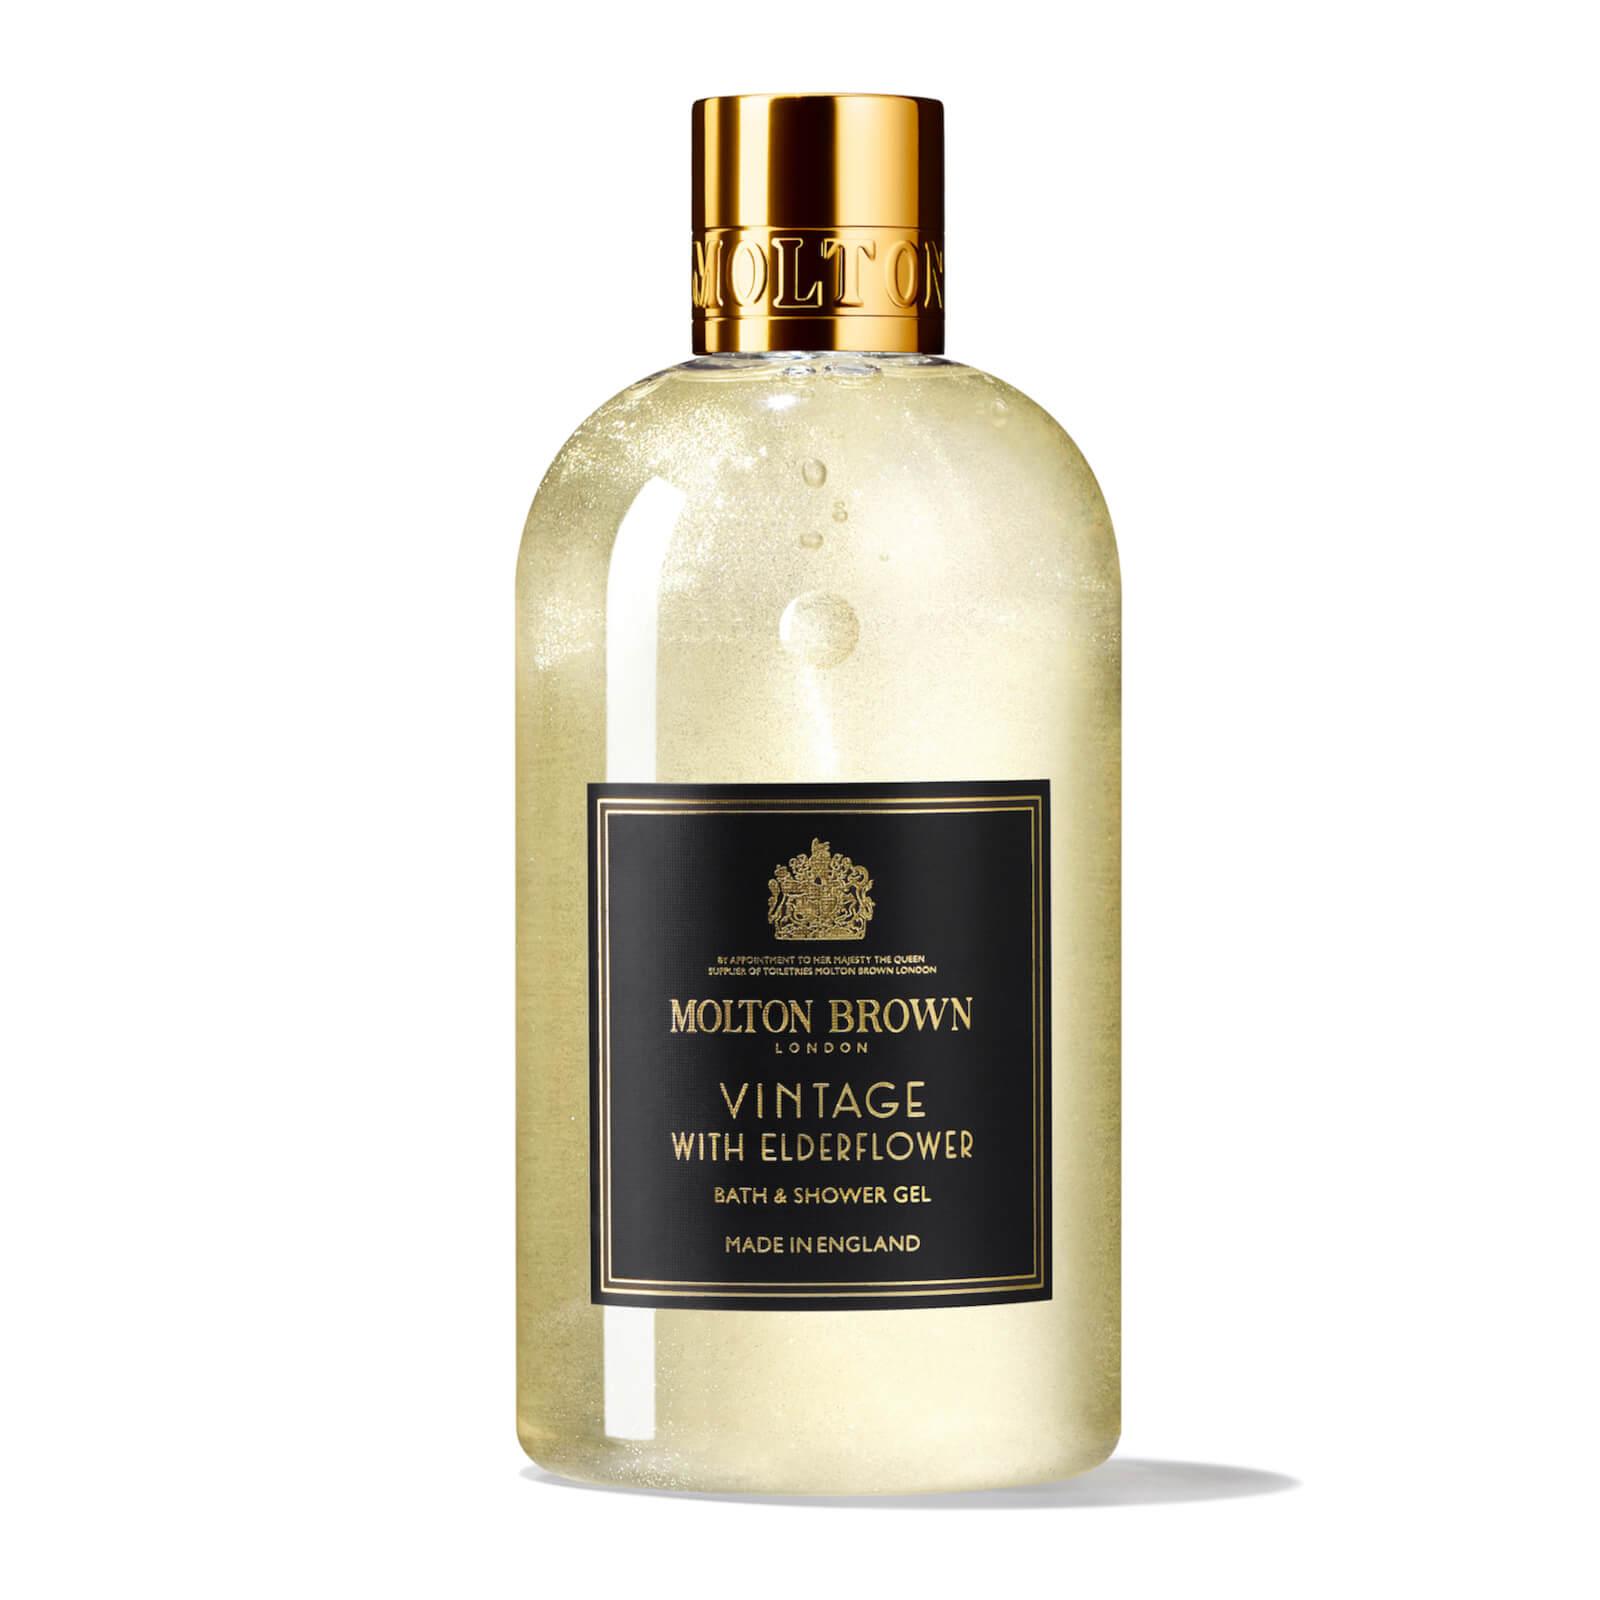 Купить Molton Brown Vintage with Elderflower Bath and Shower Gel